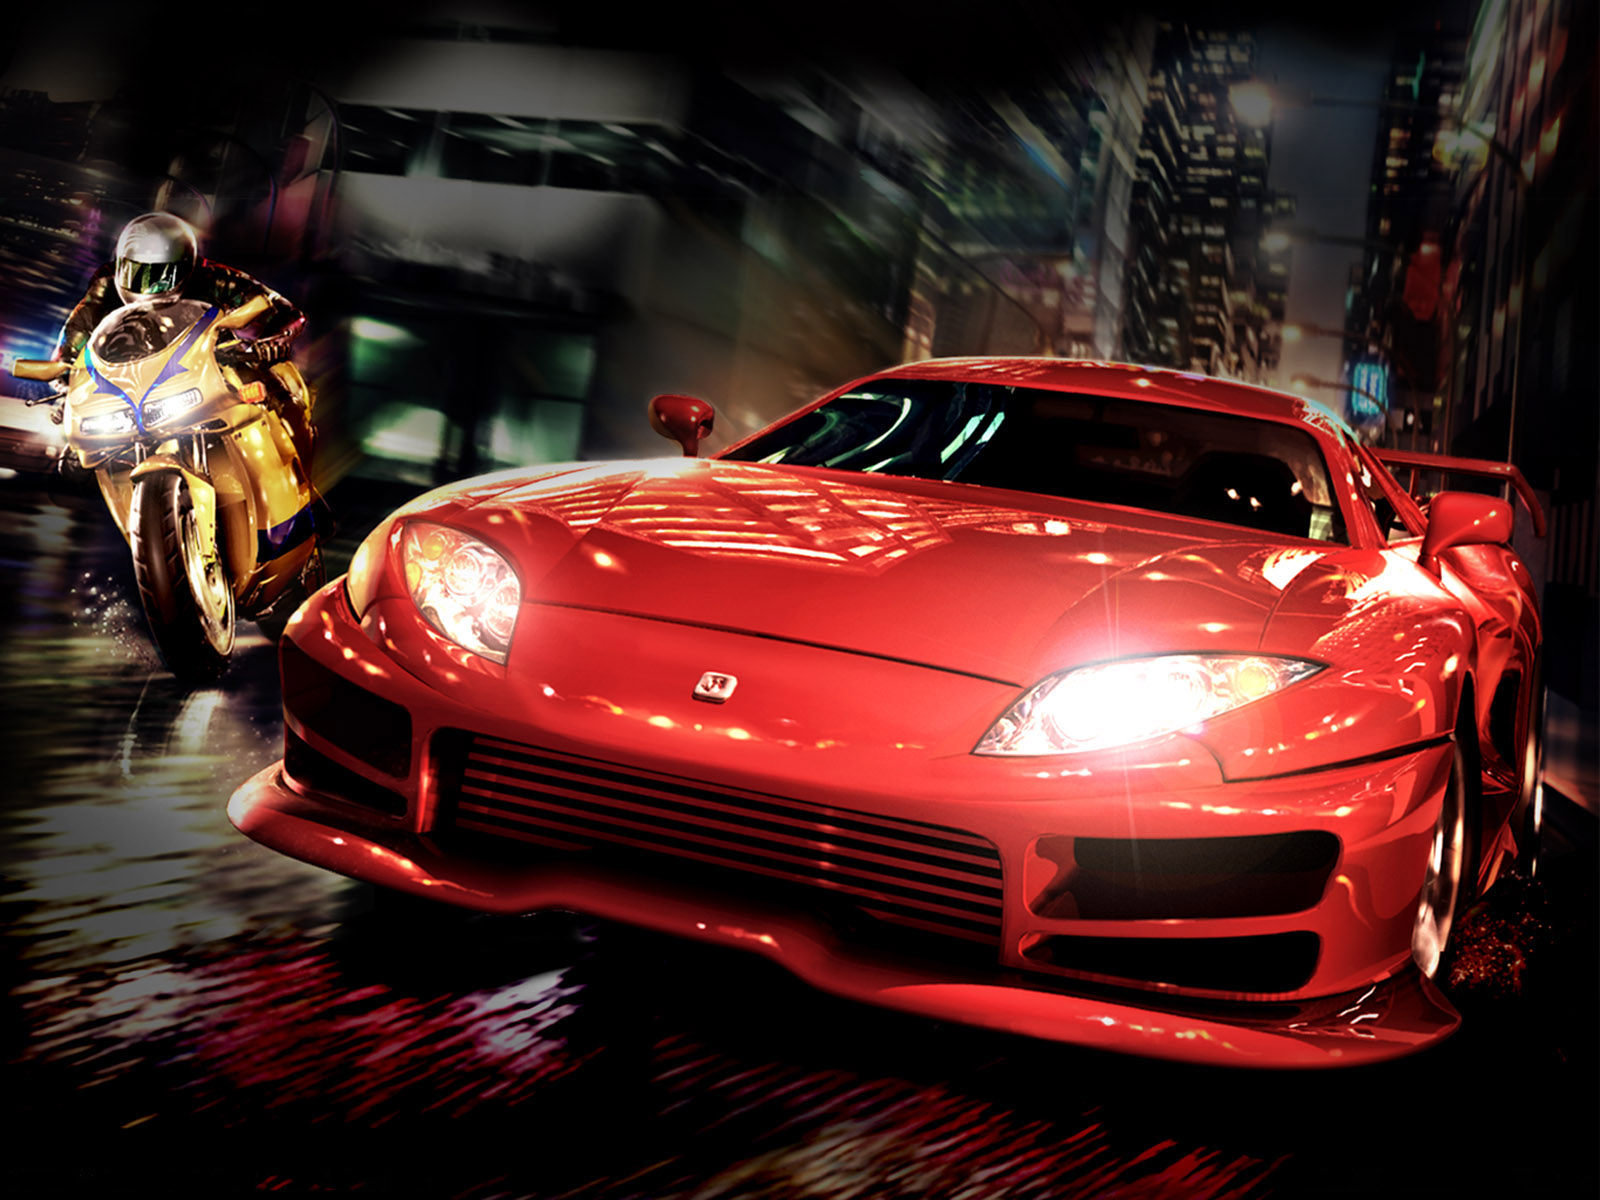 cars wallpapers desktop hd cars wallpapers desktop hd cars wallpapers 1600x1200